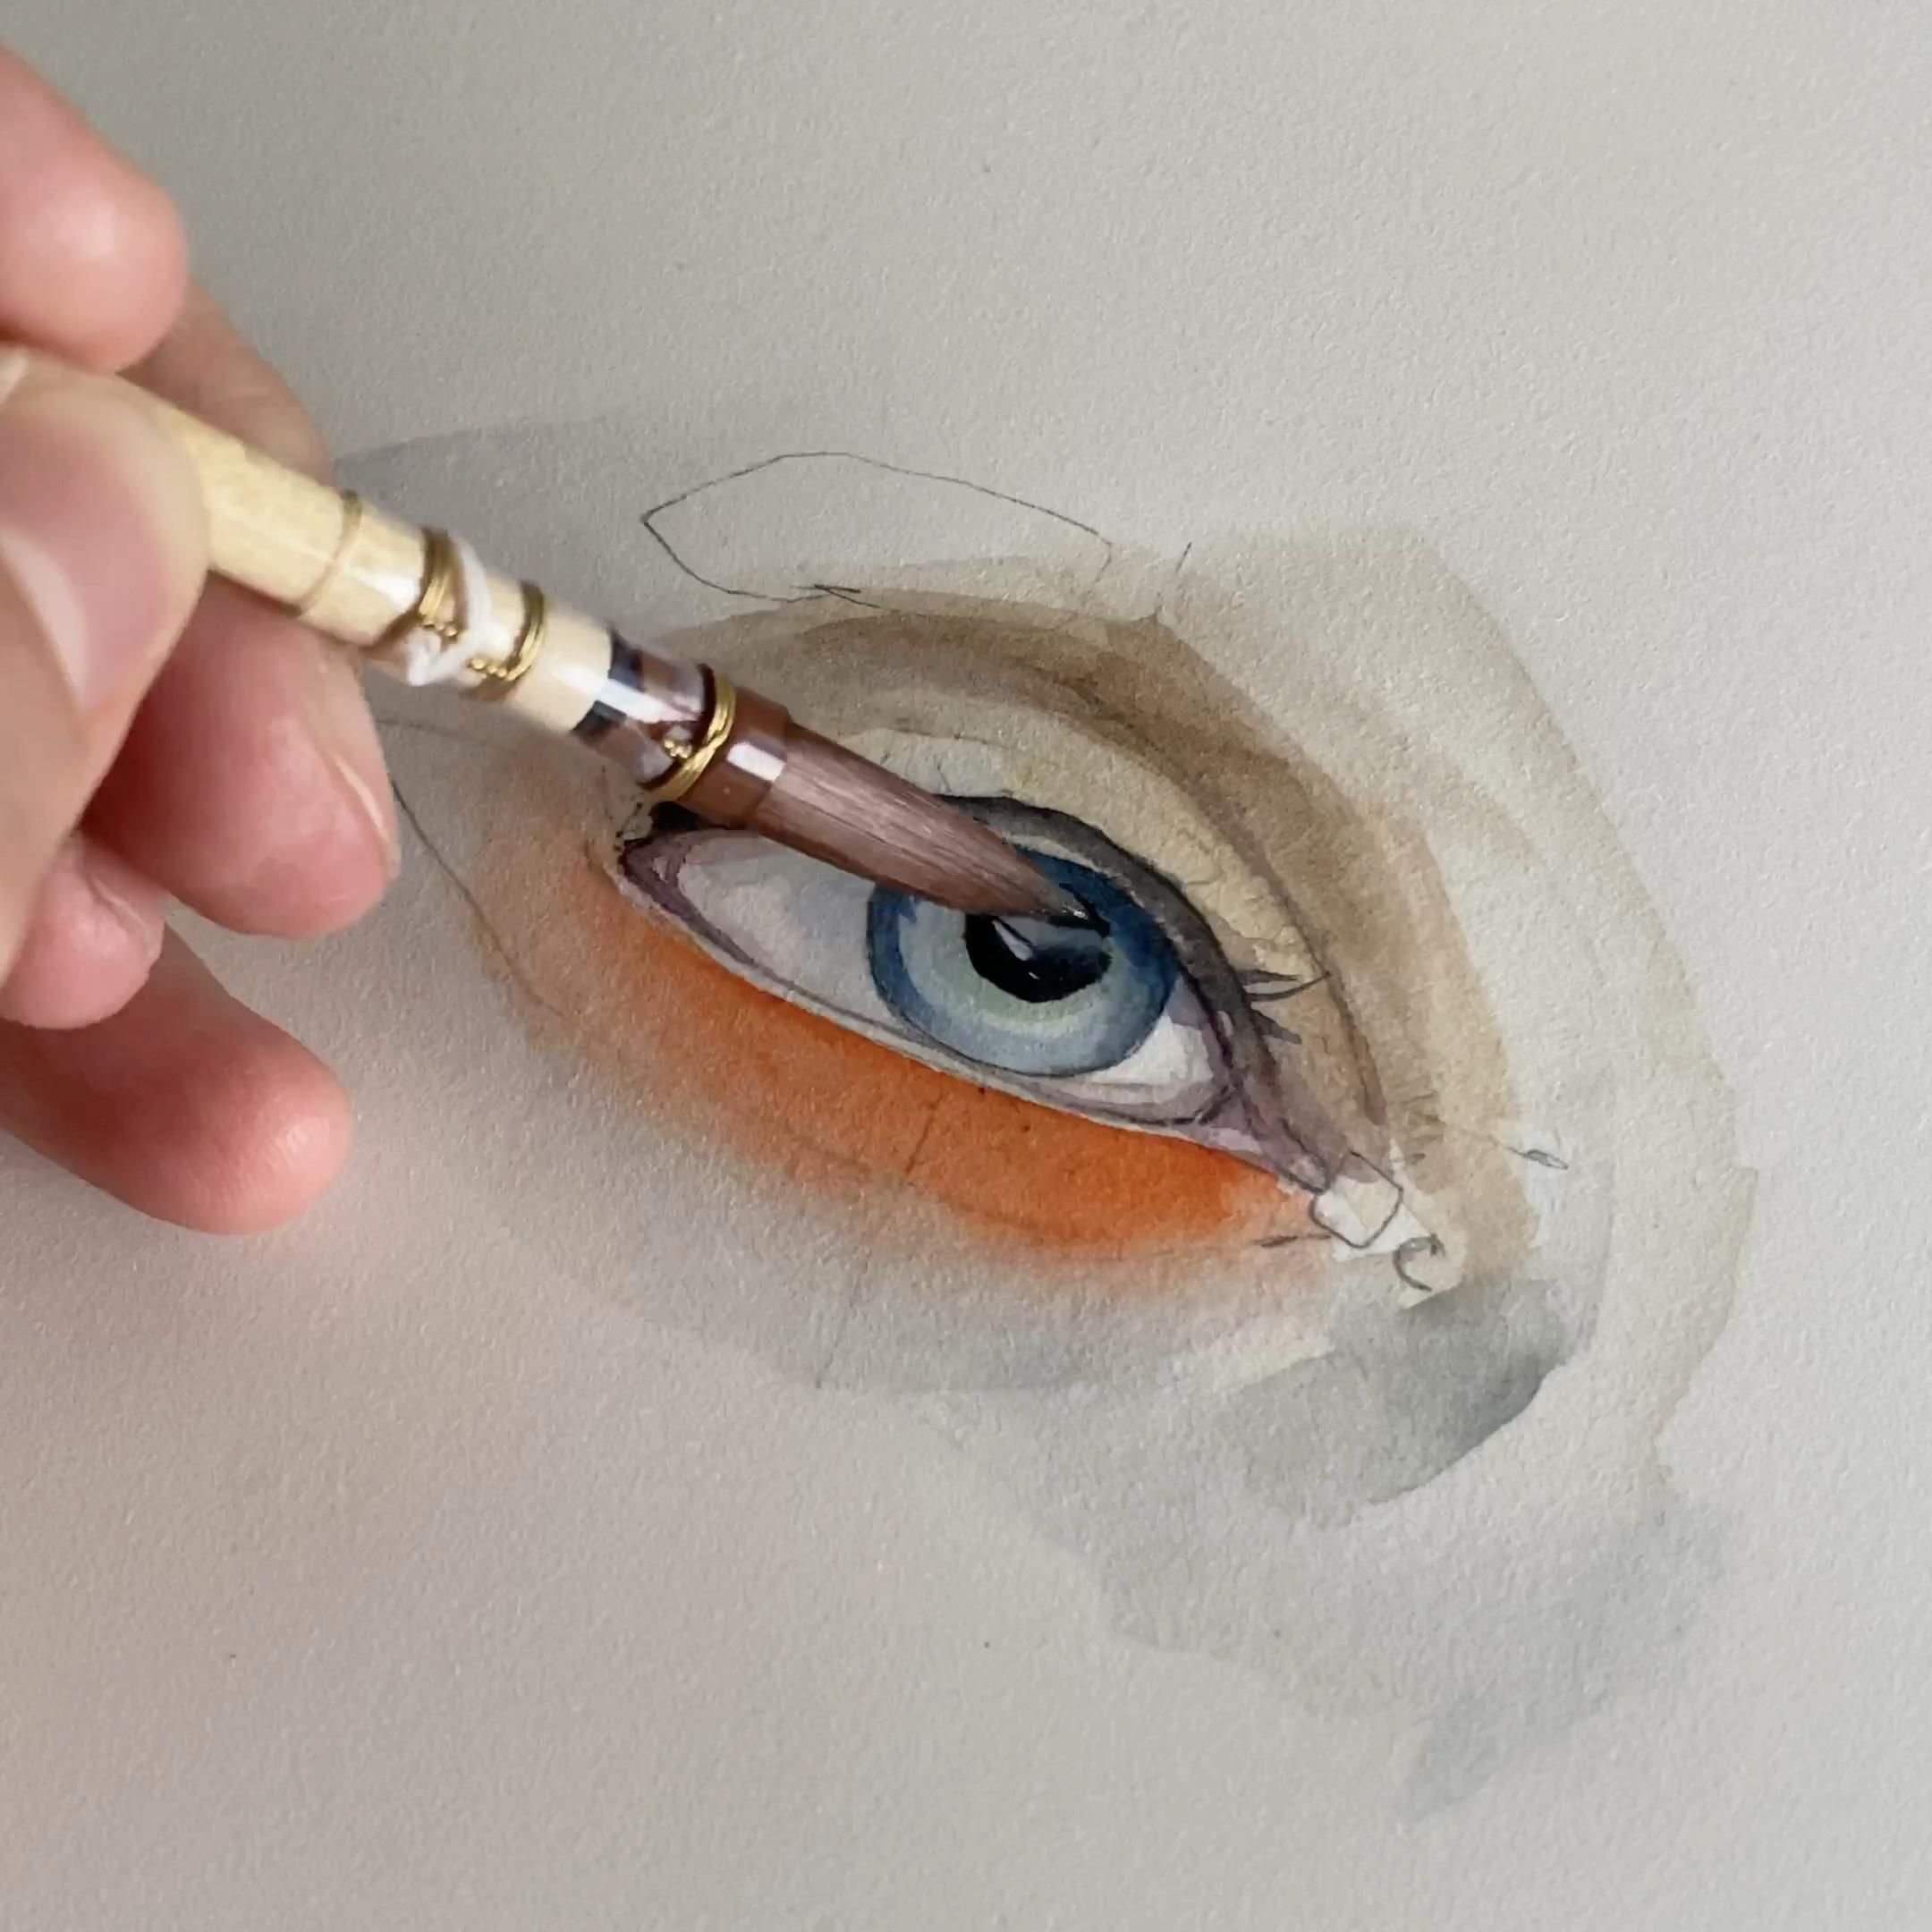 #watercolor #artist #watercolorart #contemporaryart #sydneyartist #drawing #art #australia #sydney #painting #nature#eyedrawing